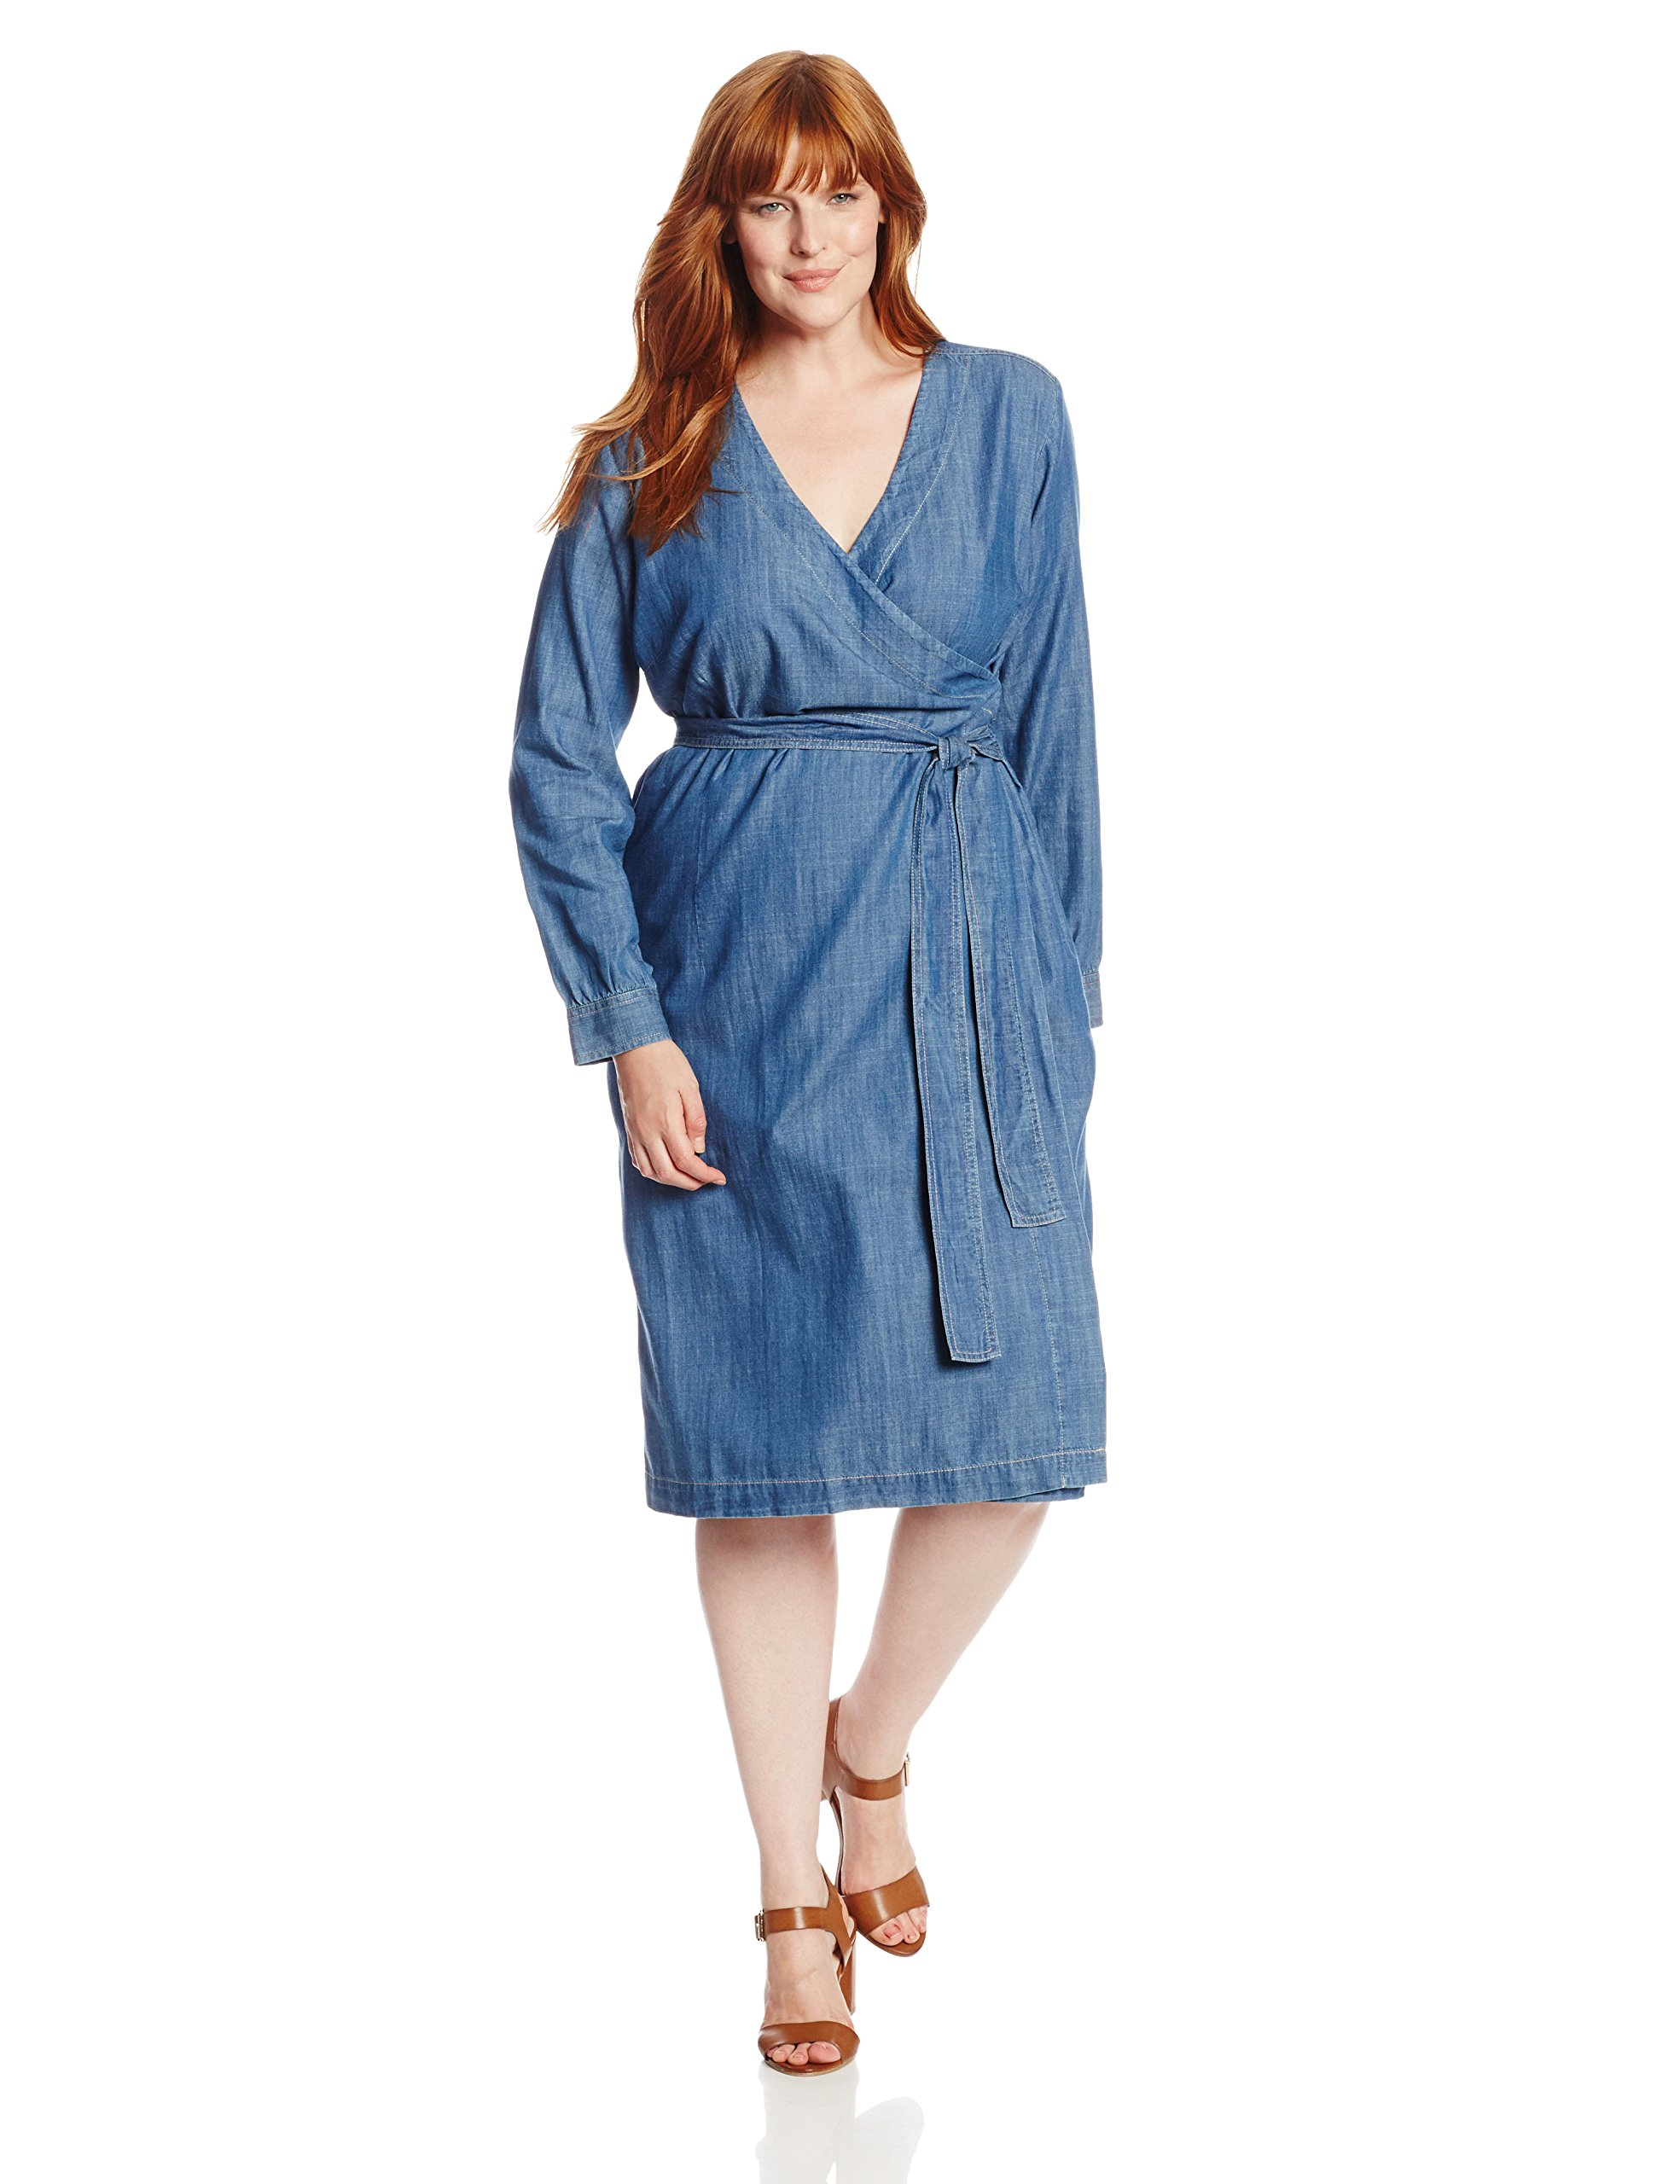 Plus Size Clothing Spring 2015 Trends - Denim!